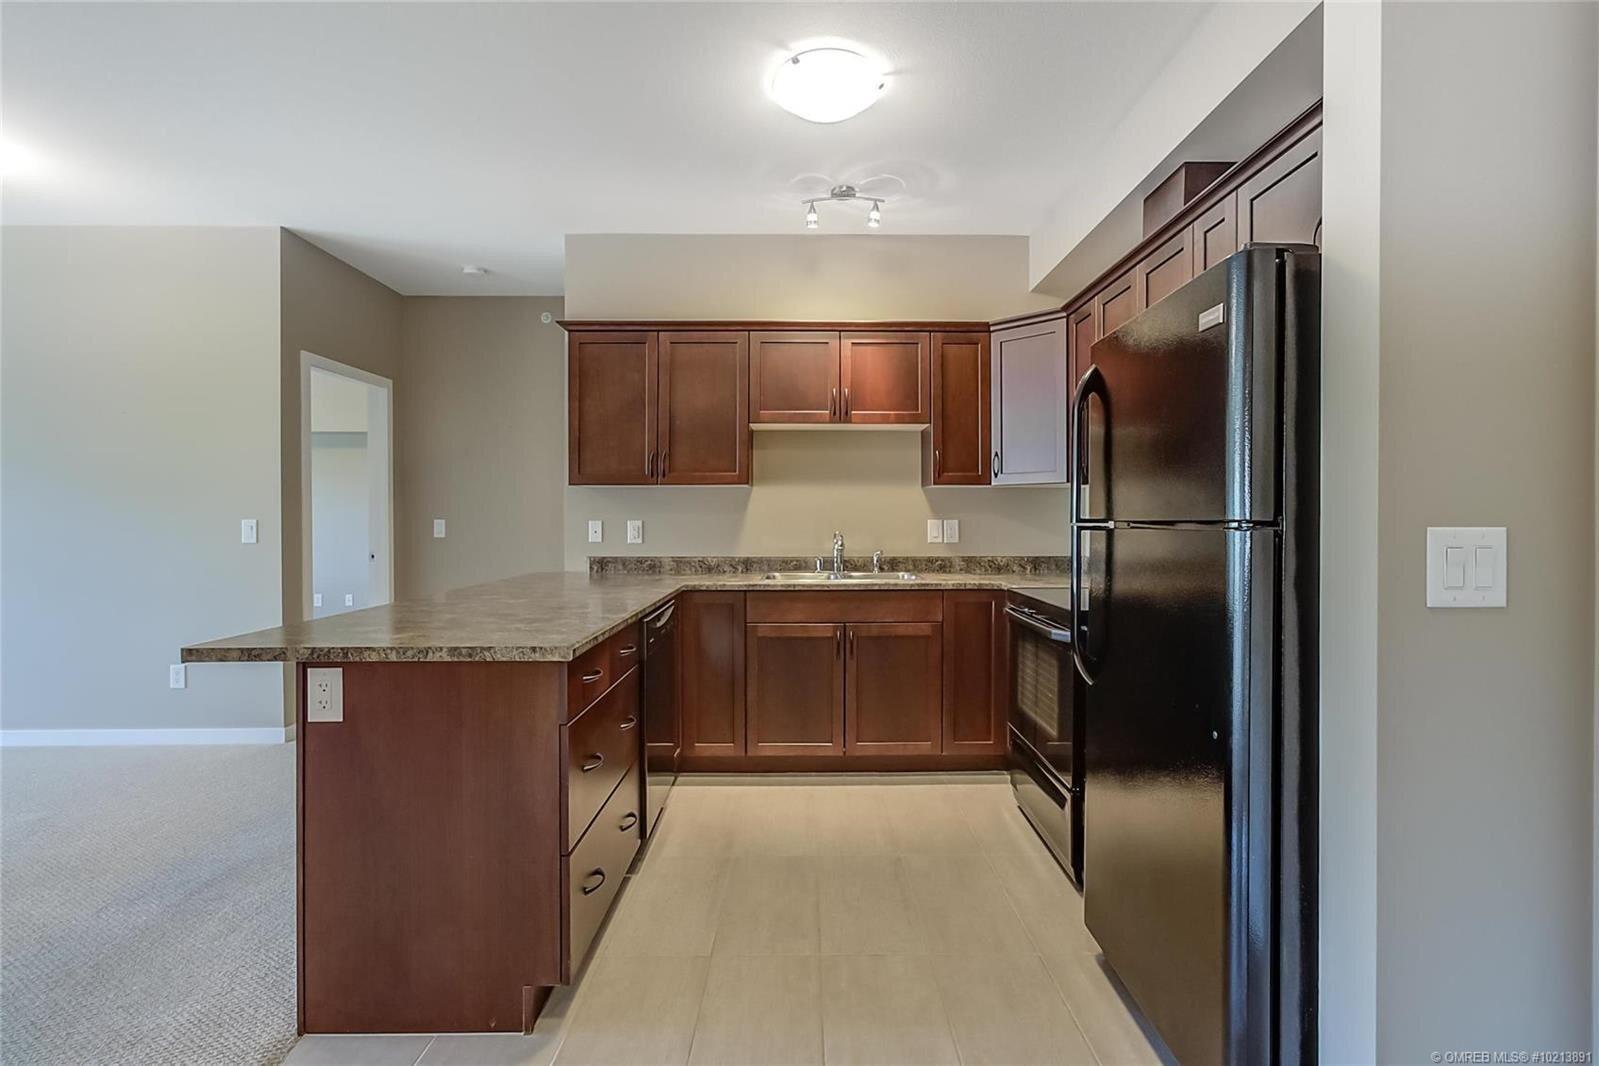 Condo for sale at 770 Rutland Rd North Unit 409 Kelowna British Columbia - MLS: 10213891